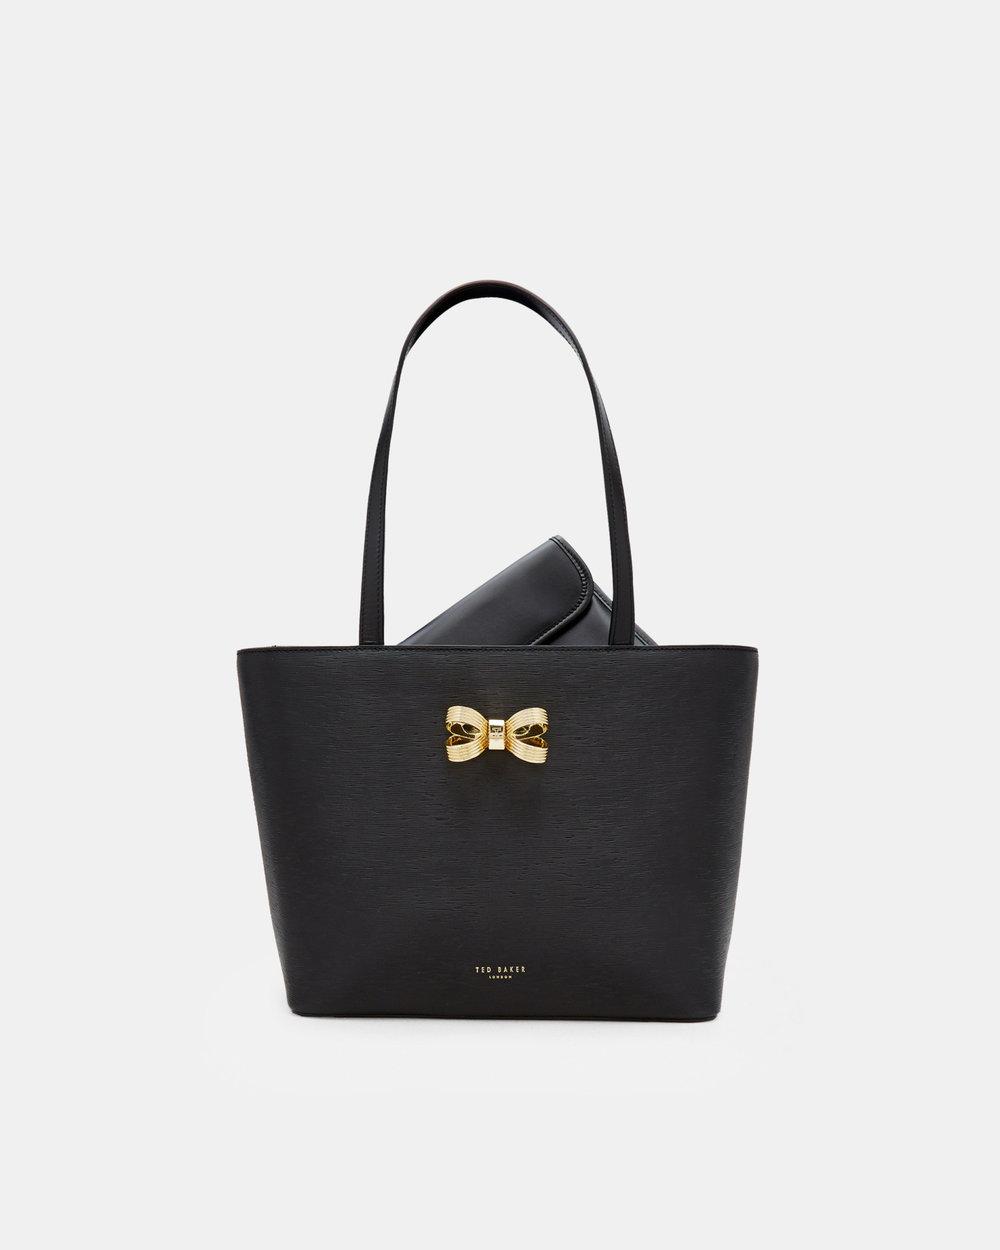 uk%2FWomens%2FAccessories%2FBags%2FBOWDAI-Loop-bow-small-leather-shopper-bag-Black%2FXA7W_BOWDAI_BLACK_1.jpg.jpg